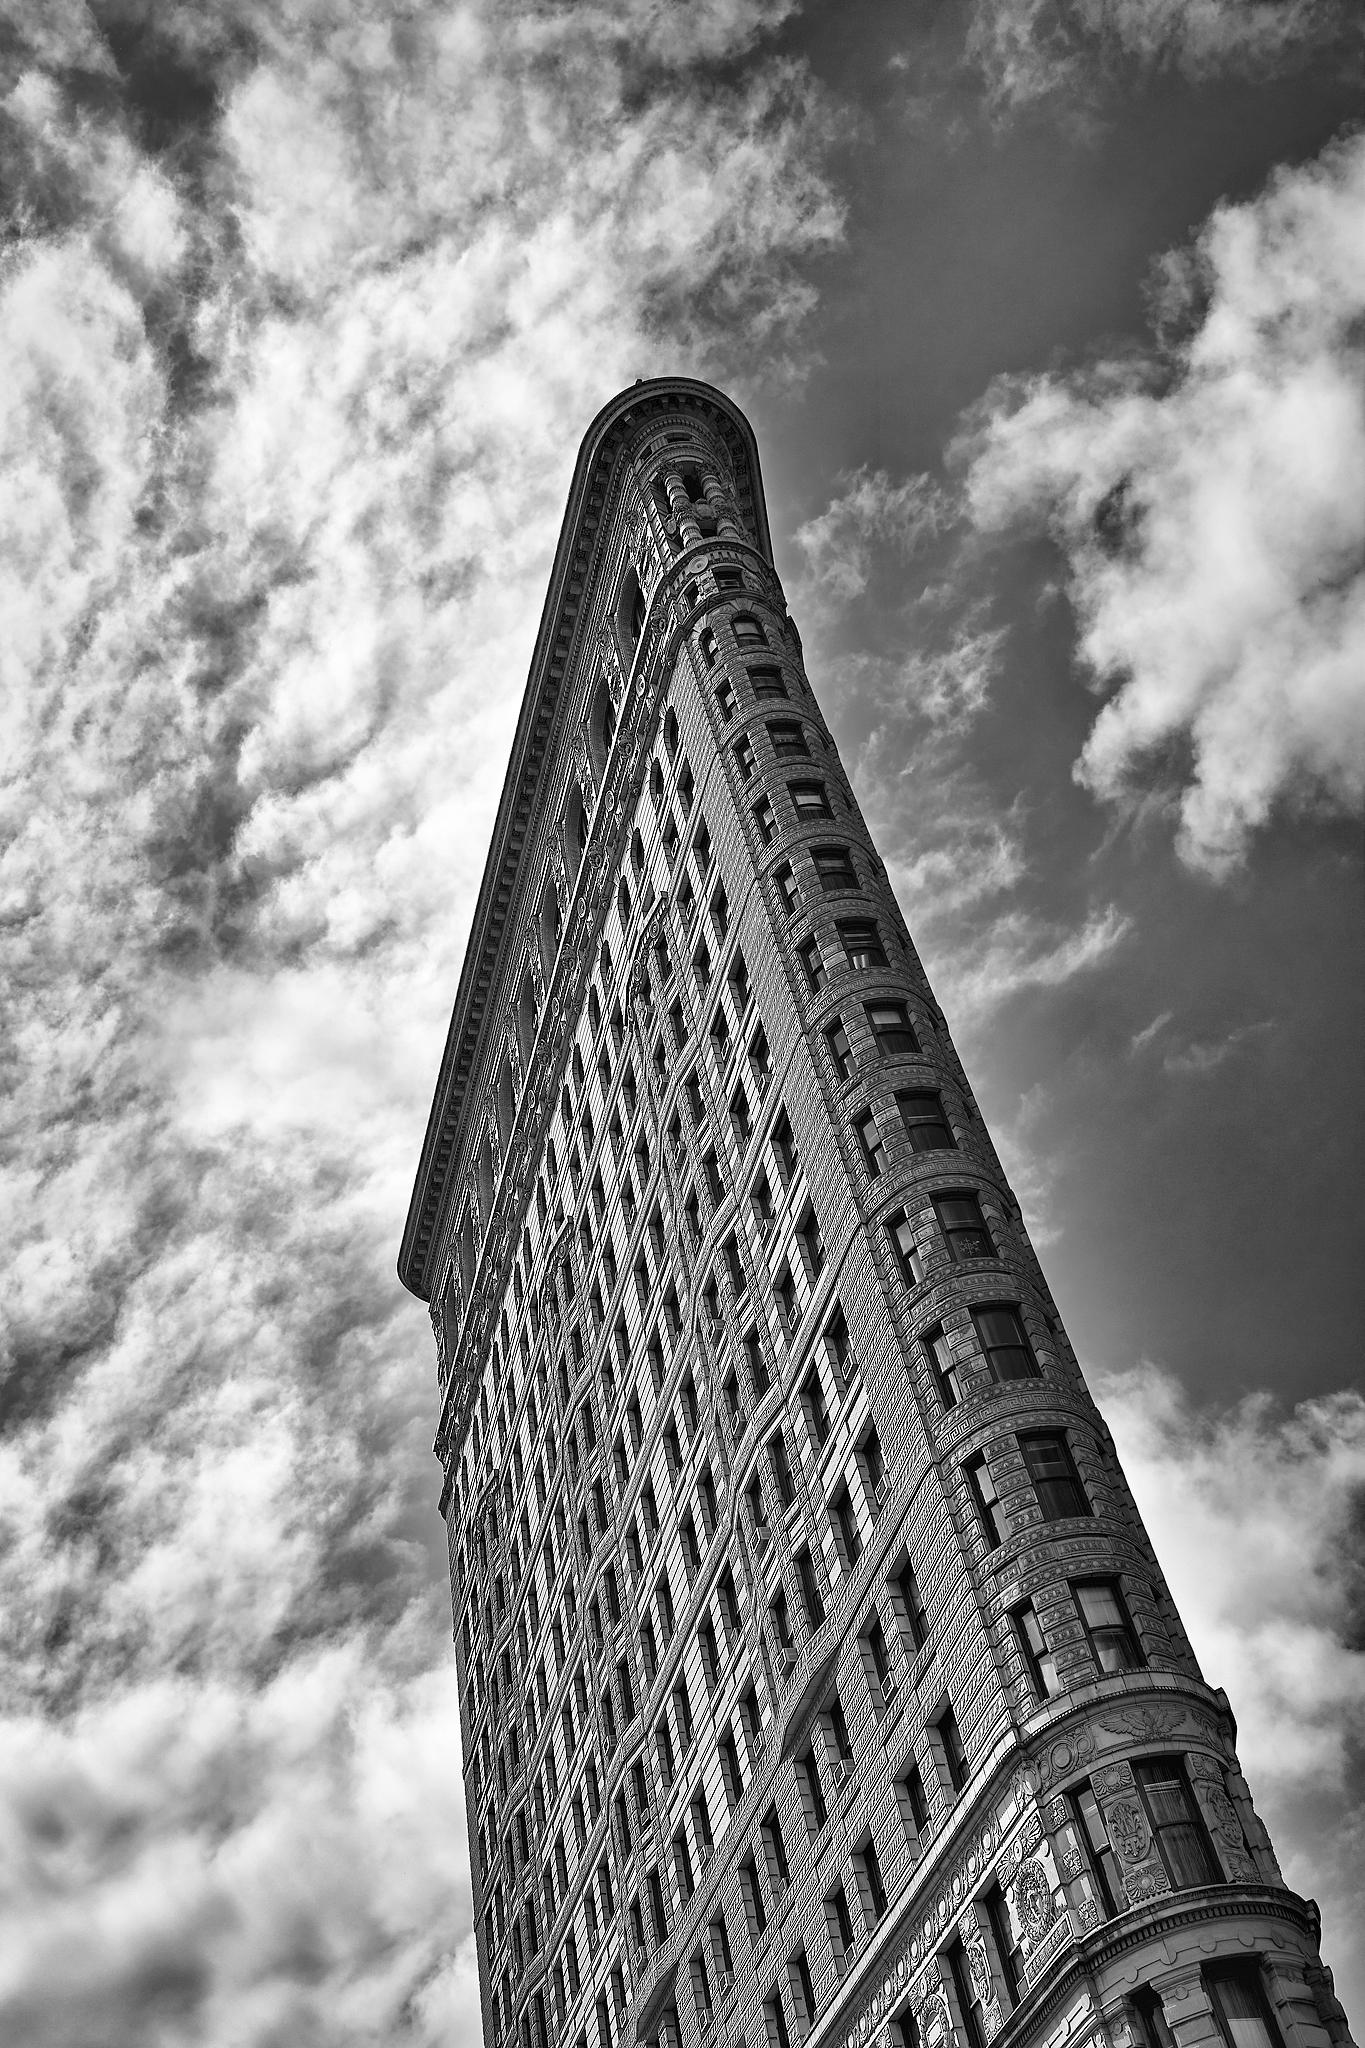 Flatiron Building by Peter Adams.